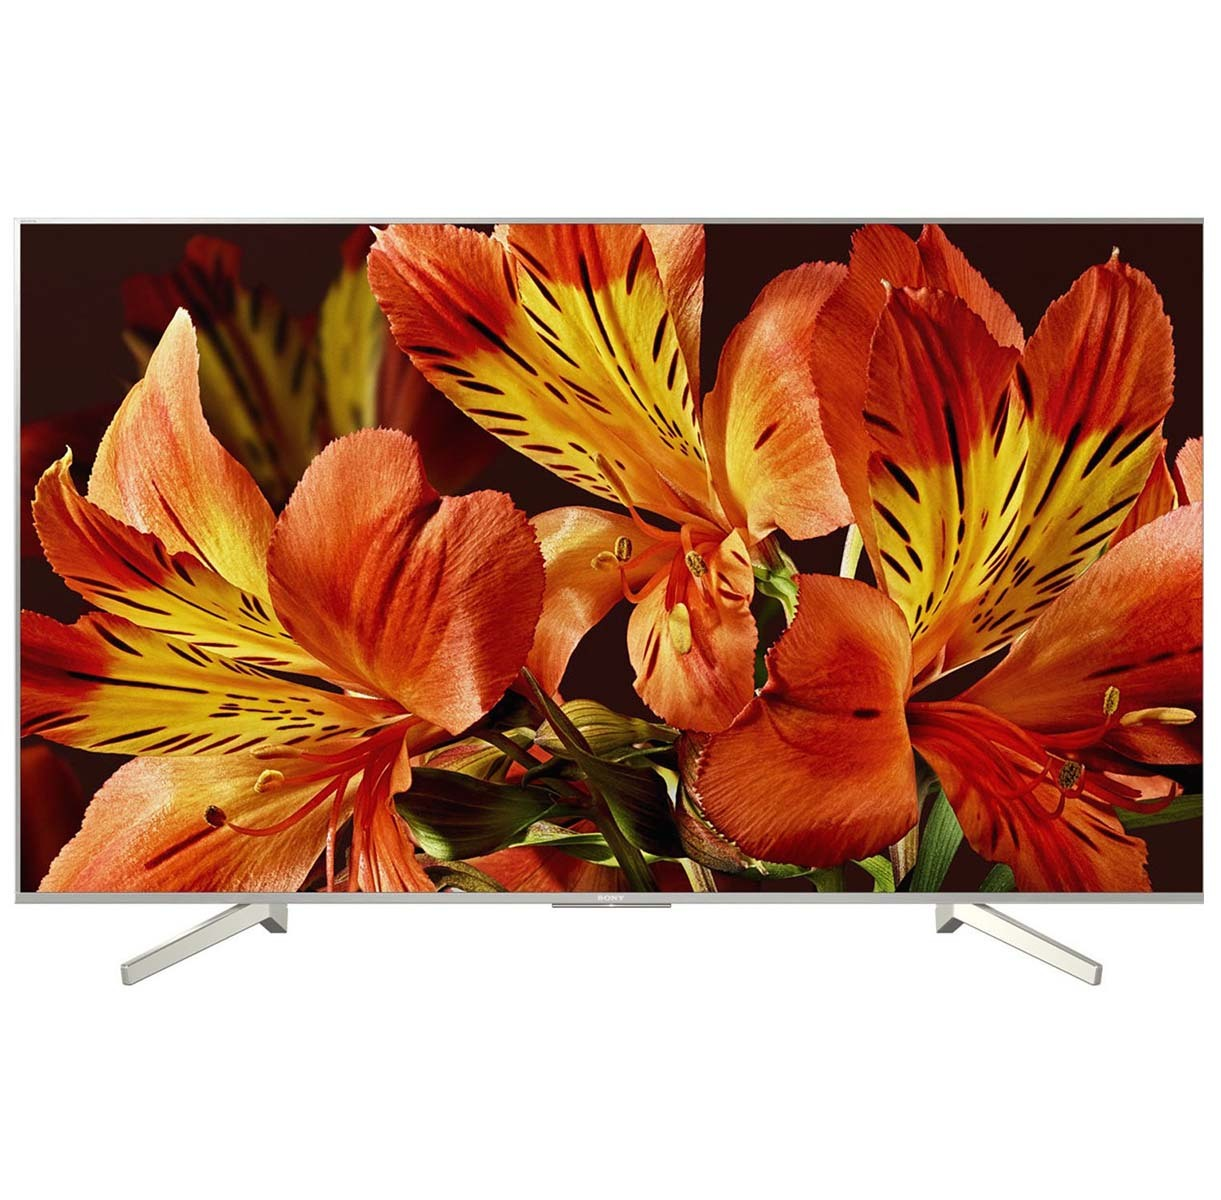 KD-55XF8577 телевизор Sony Bravia, цвет серебристый